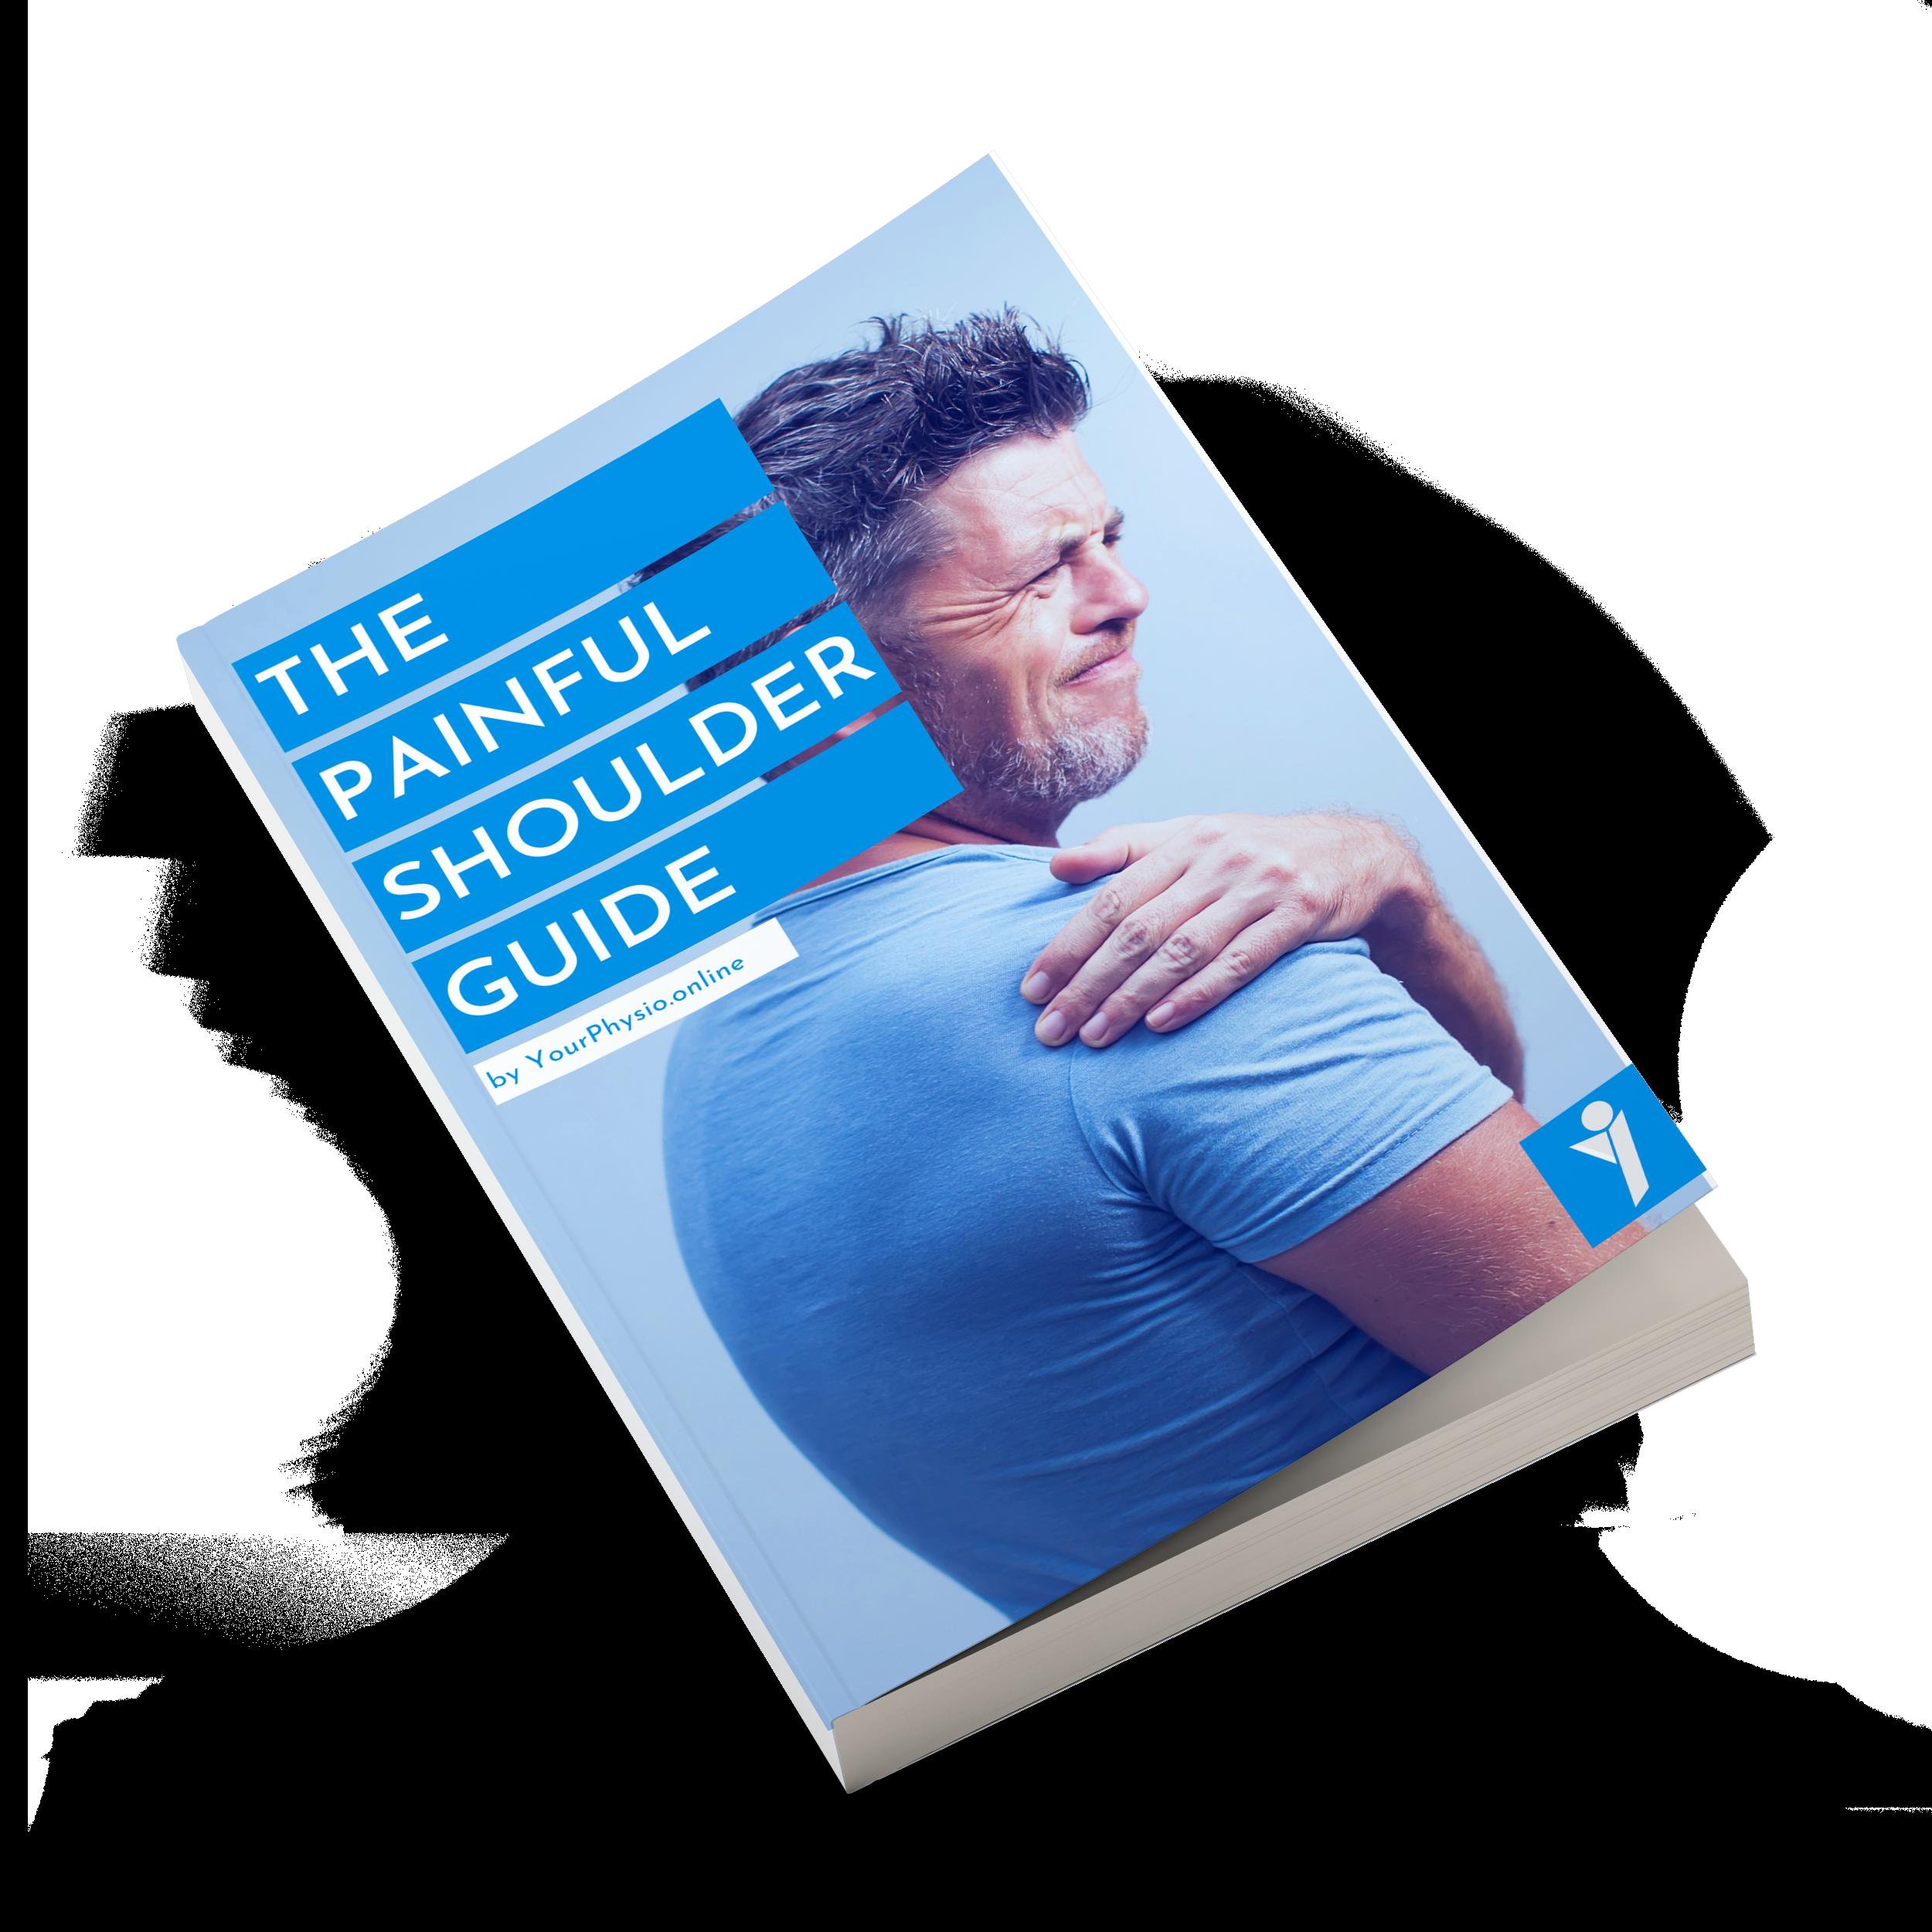 Shoulder pain guide